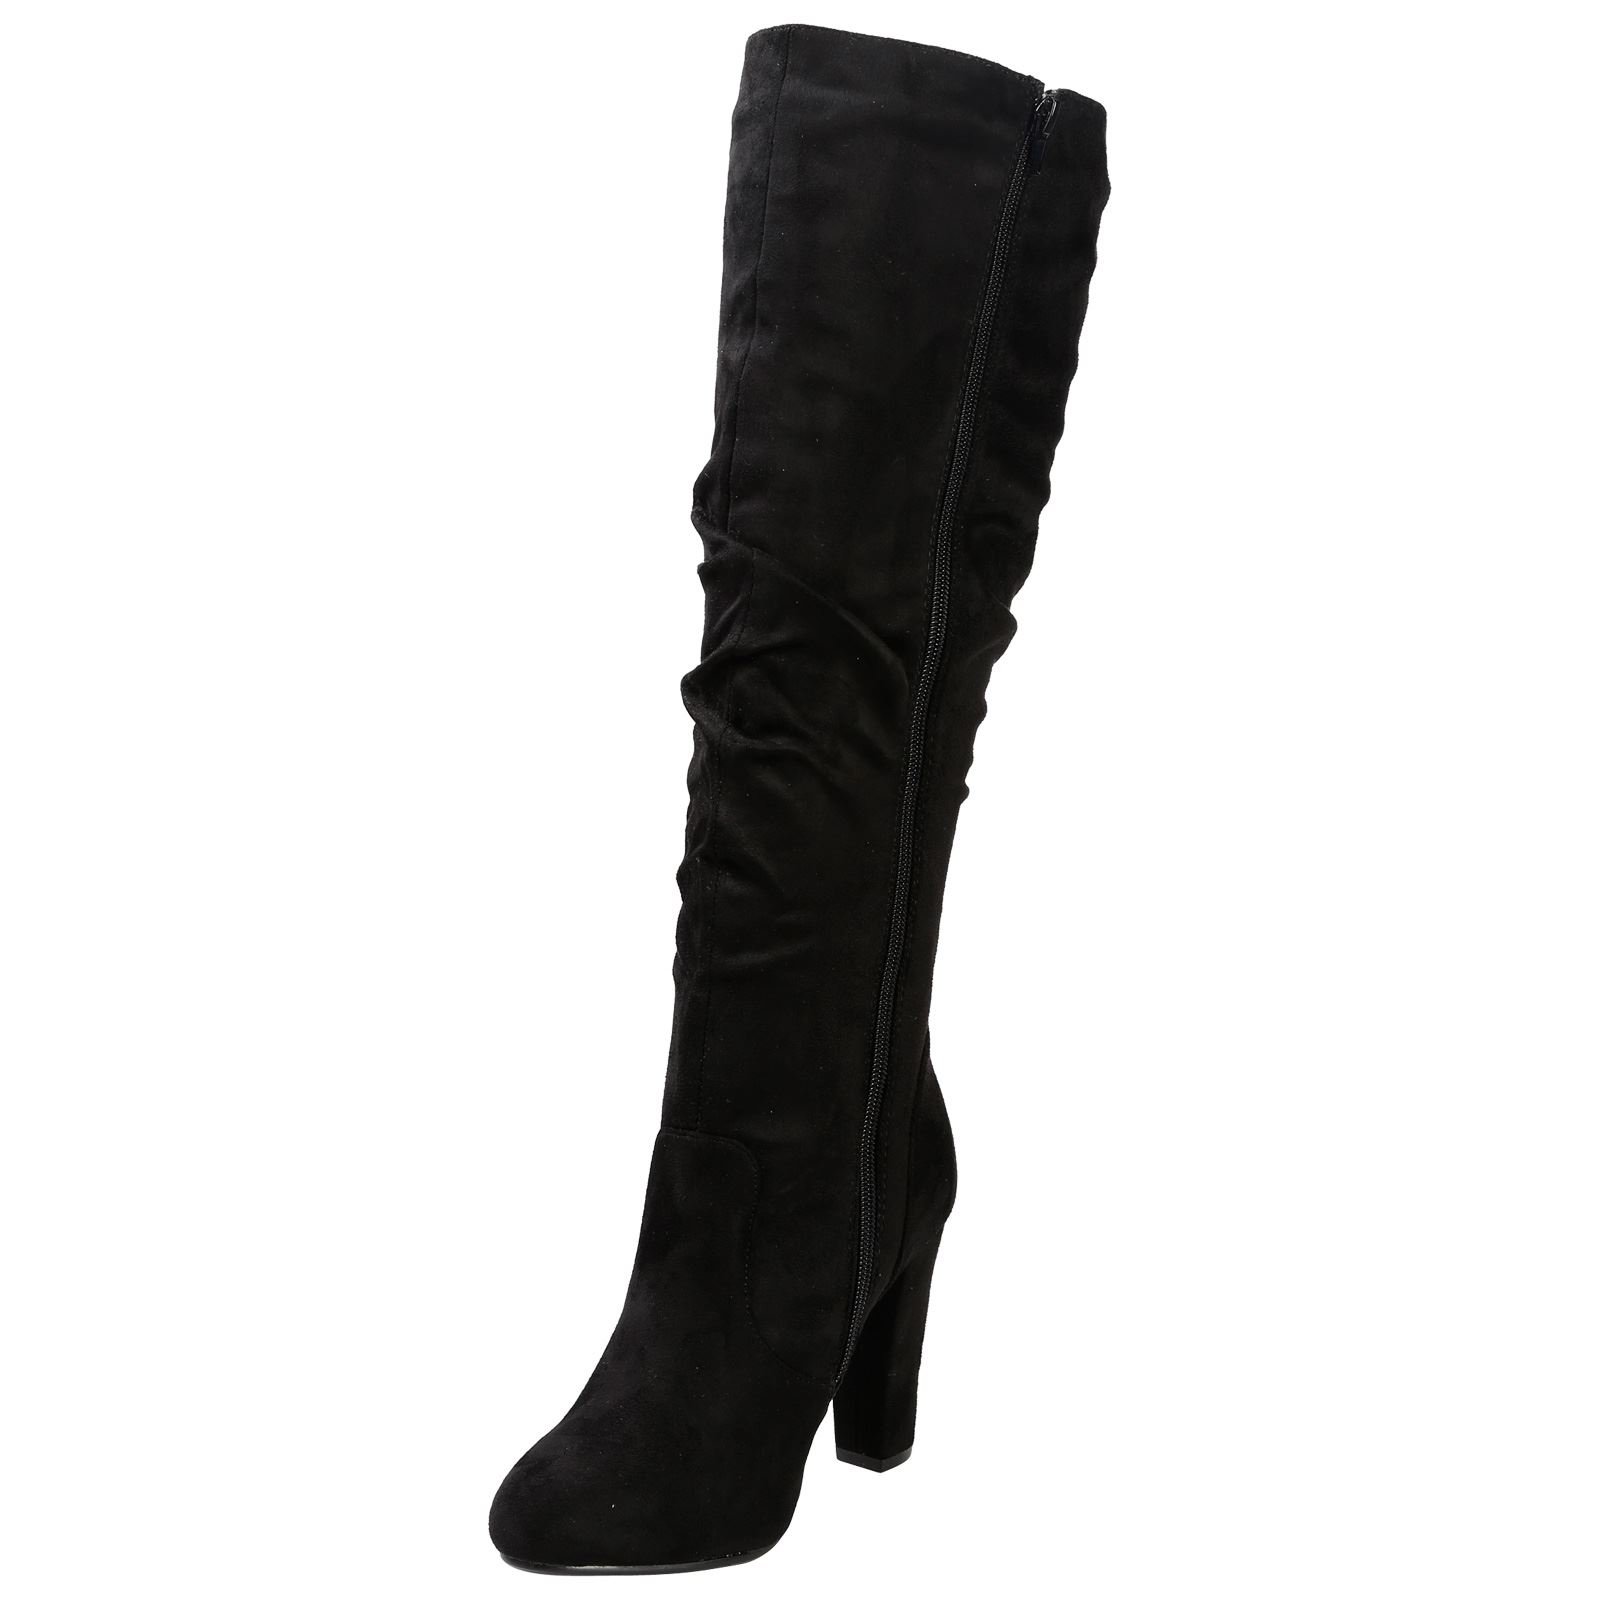 86fc41886fd Melanie Womens Block Heel Under Knee High Boots Ladies Ruched Slouch ...